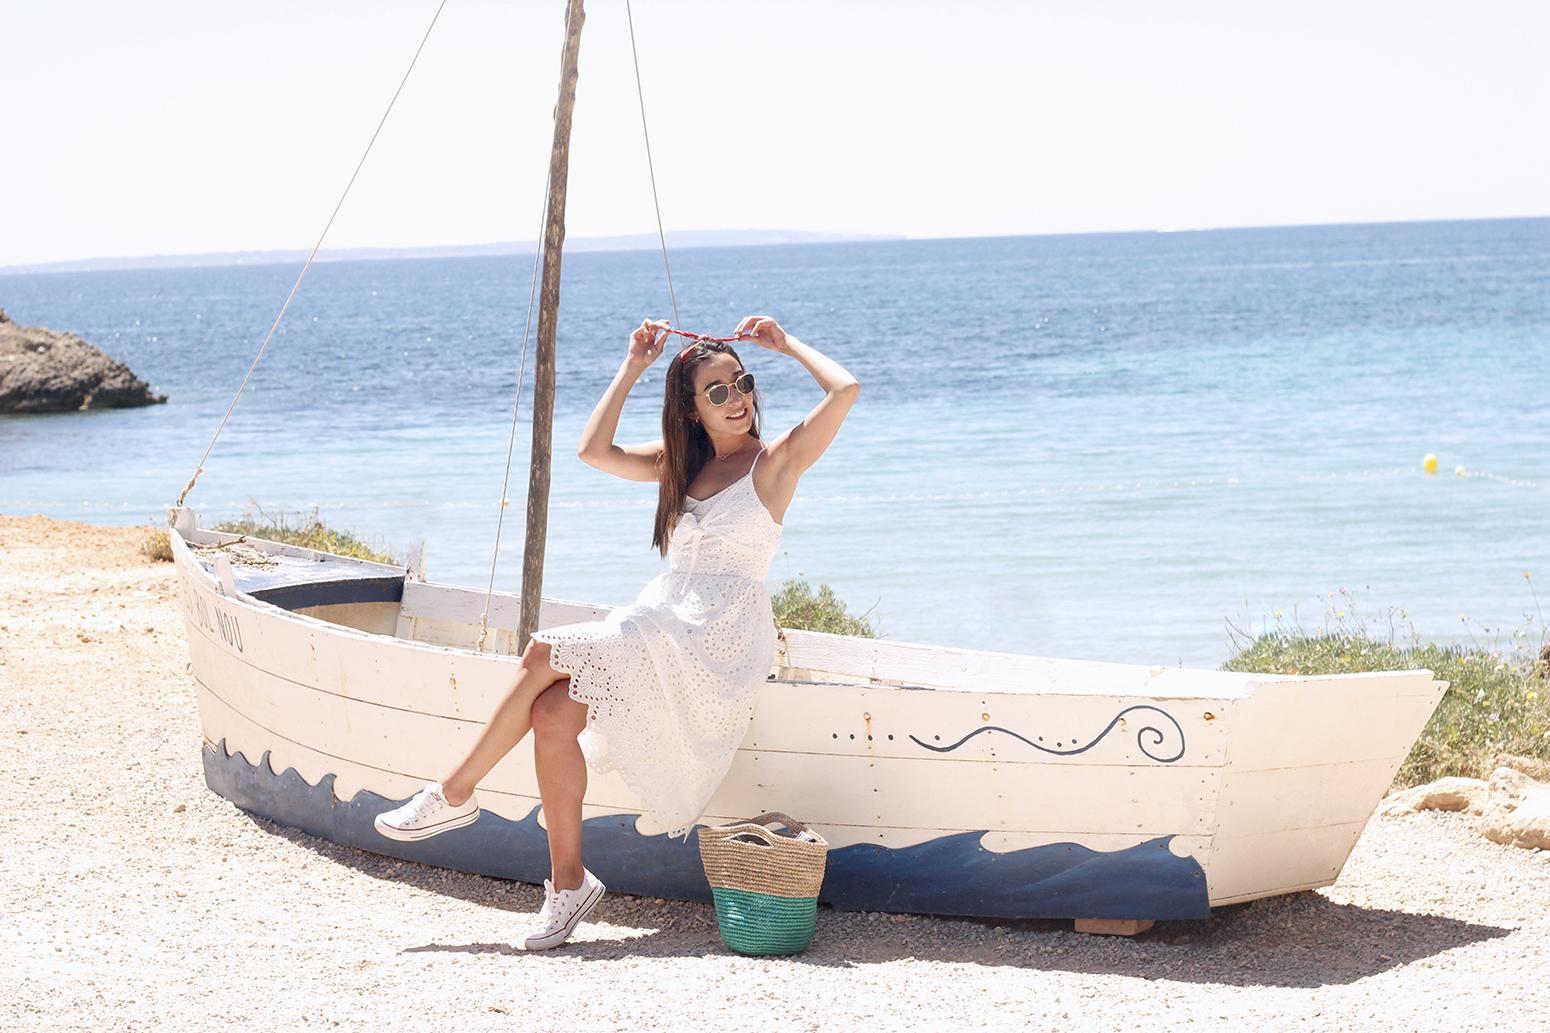 white summer dress white converse rayban sunglasses 2019 street style outfit vacation ibiza5